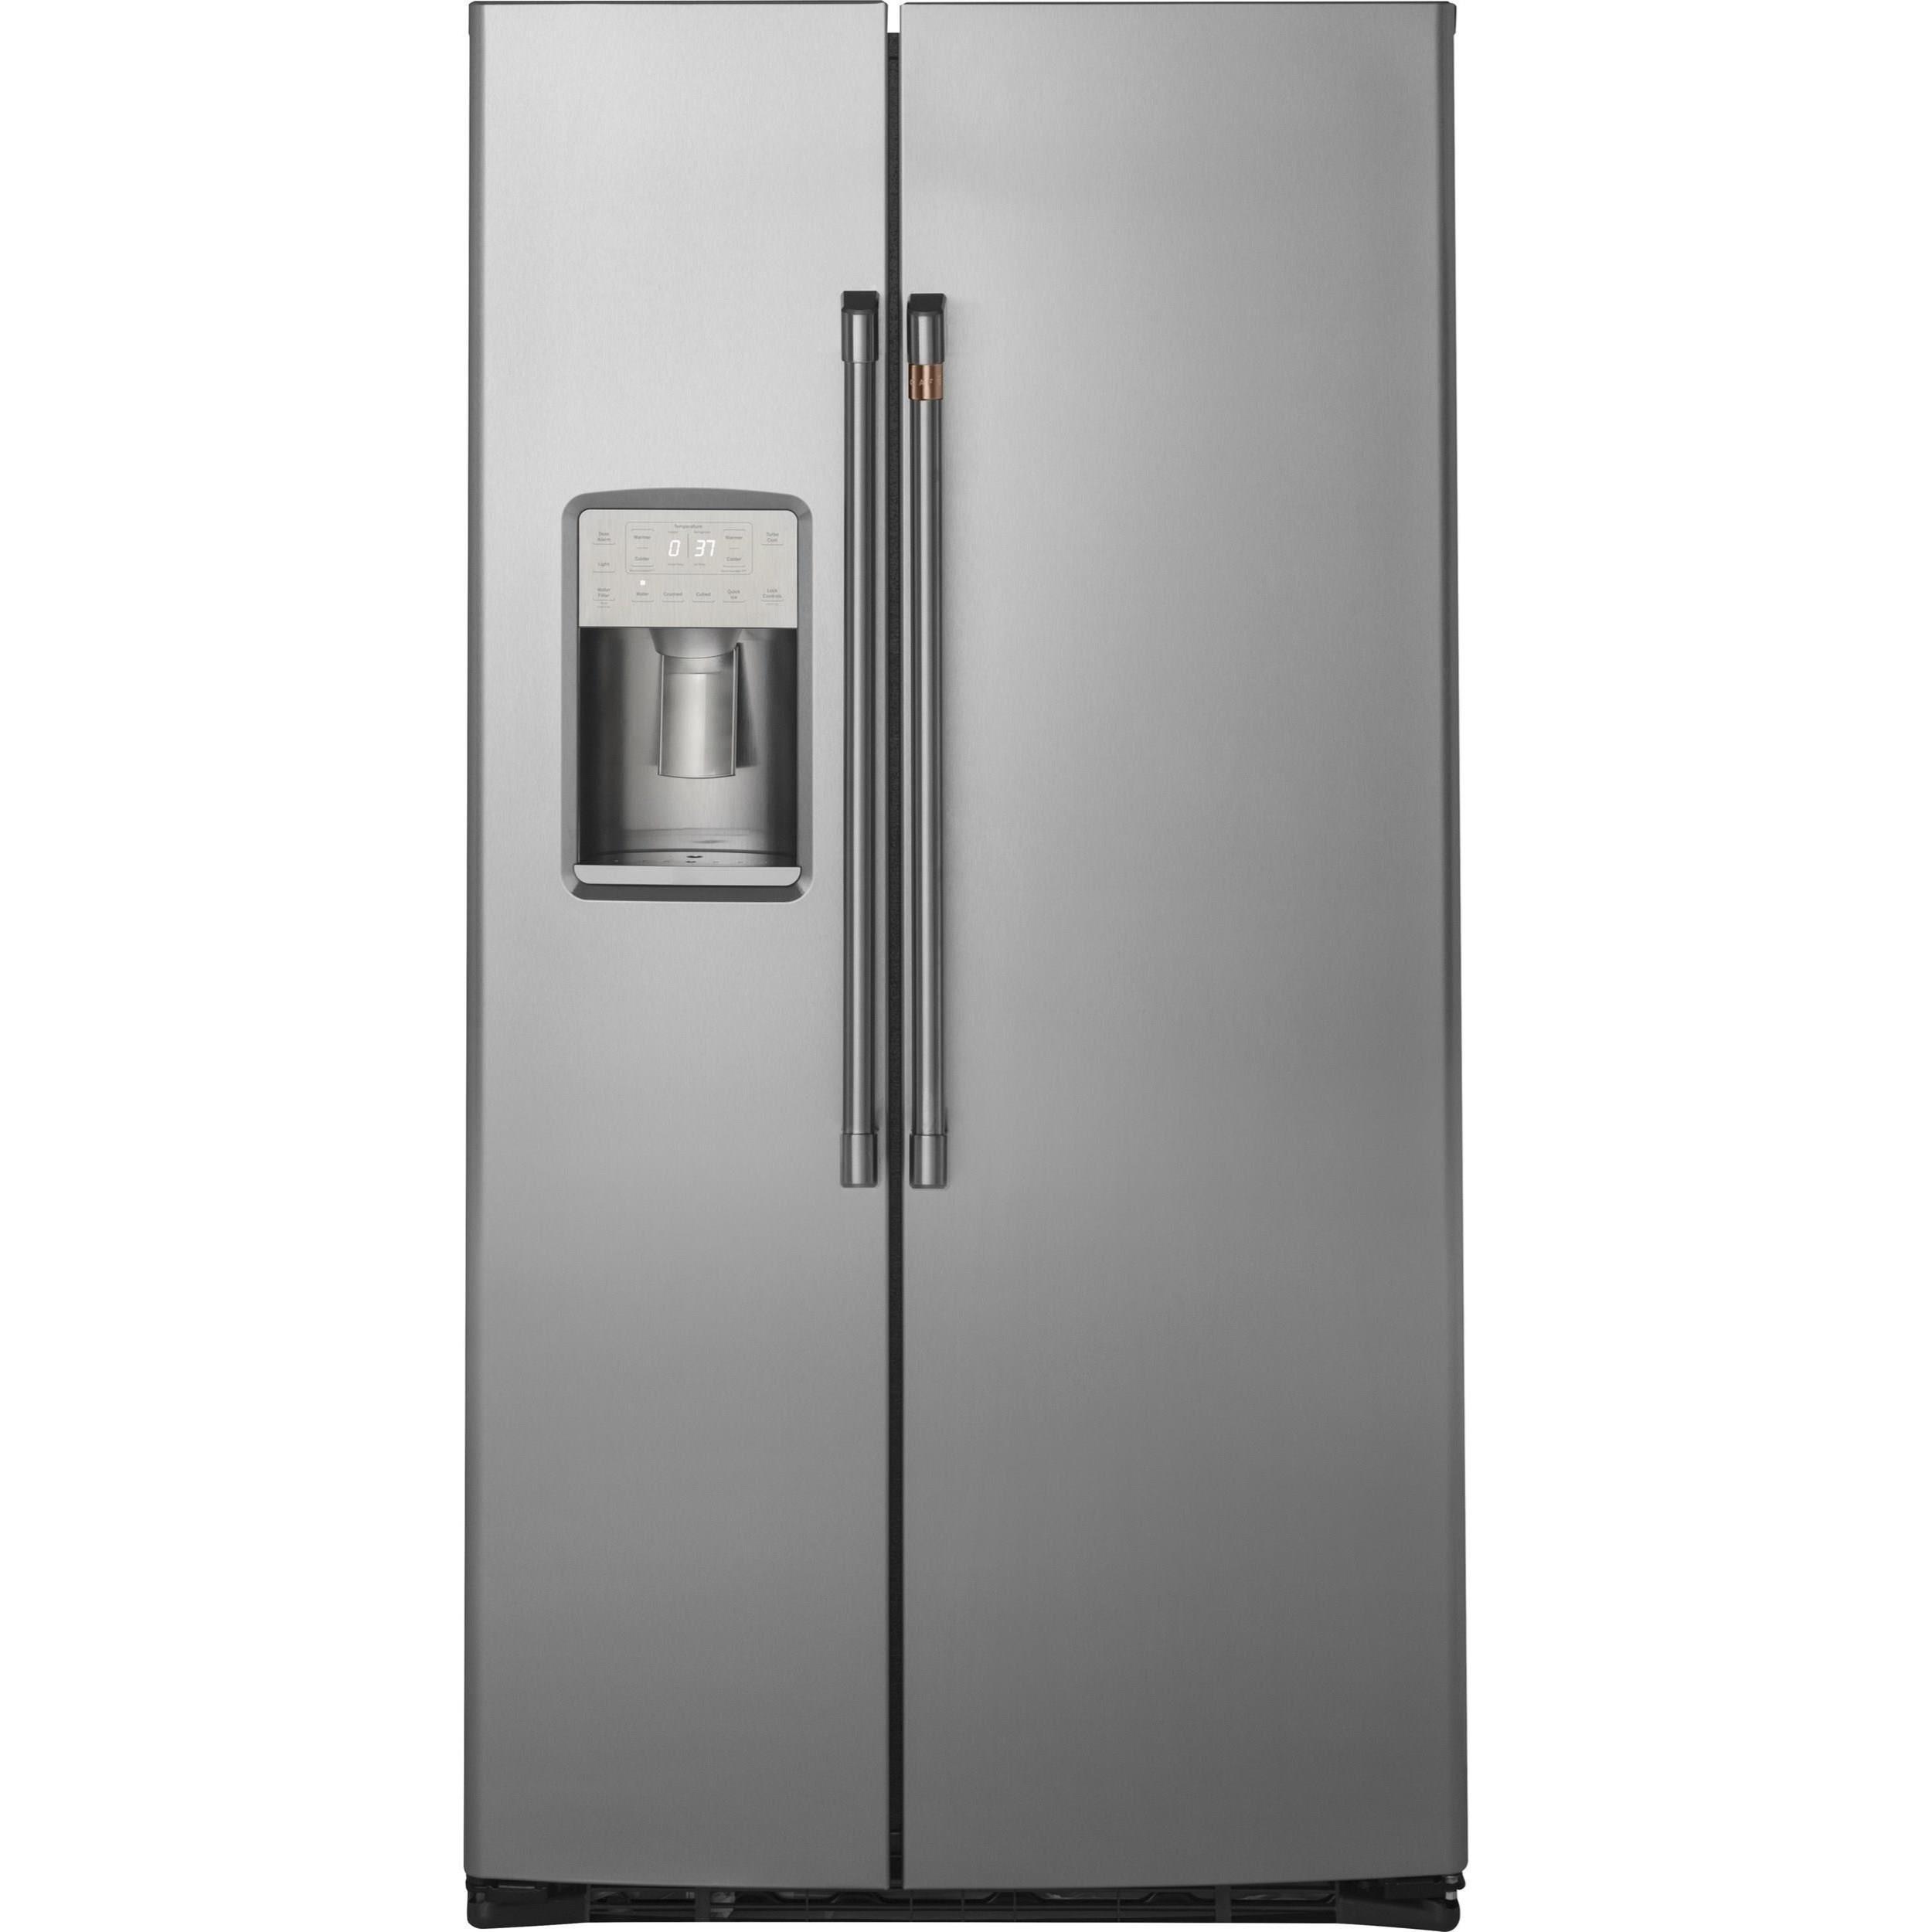 Cafe´™ 21.9 Cu. Ft. Counter-Depth Side-By-Side Refrigerator